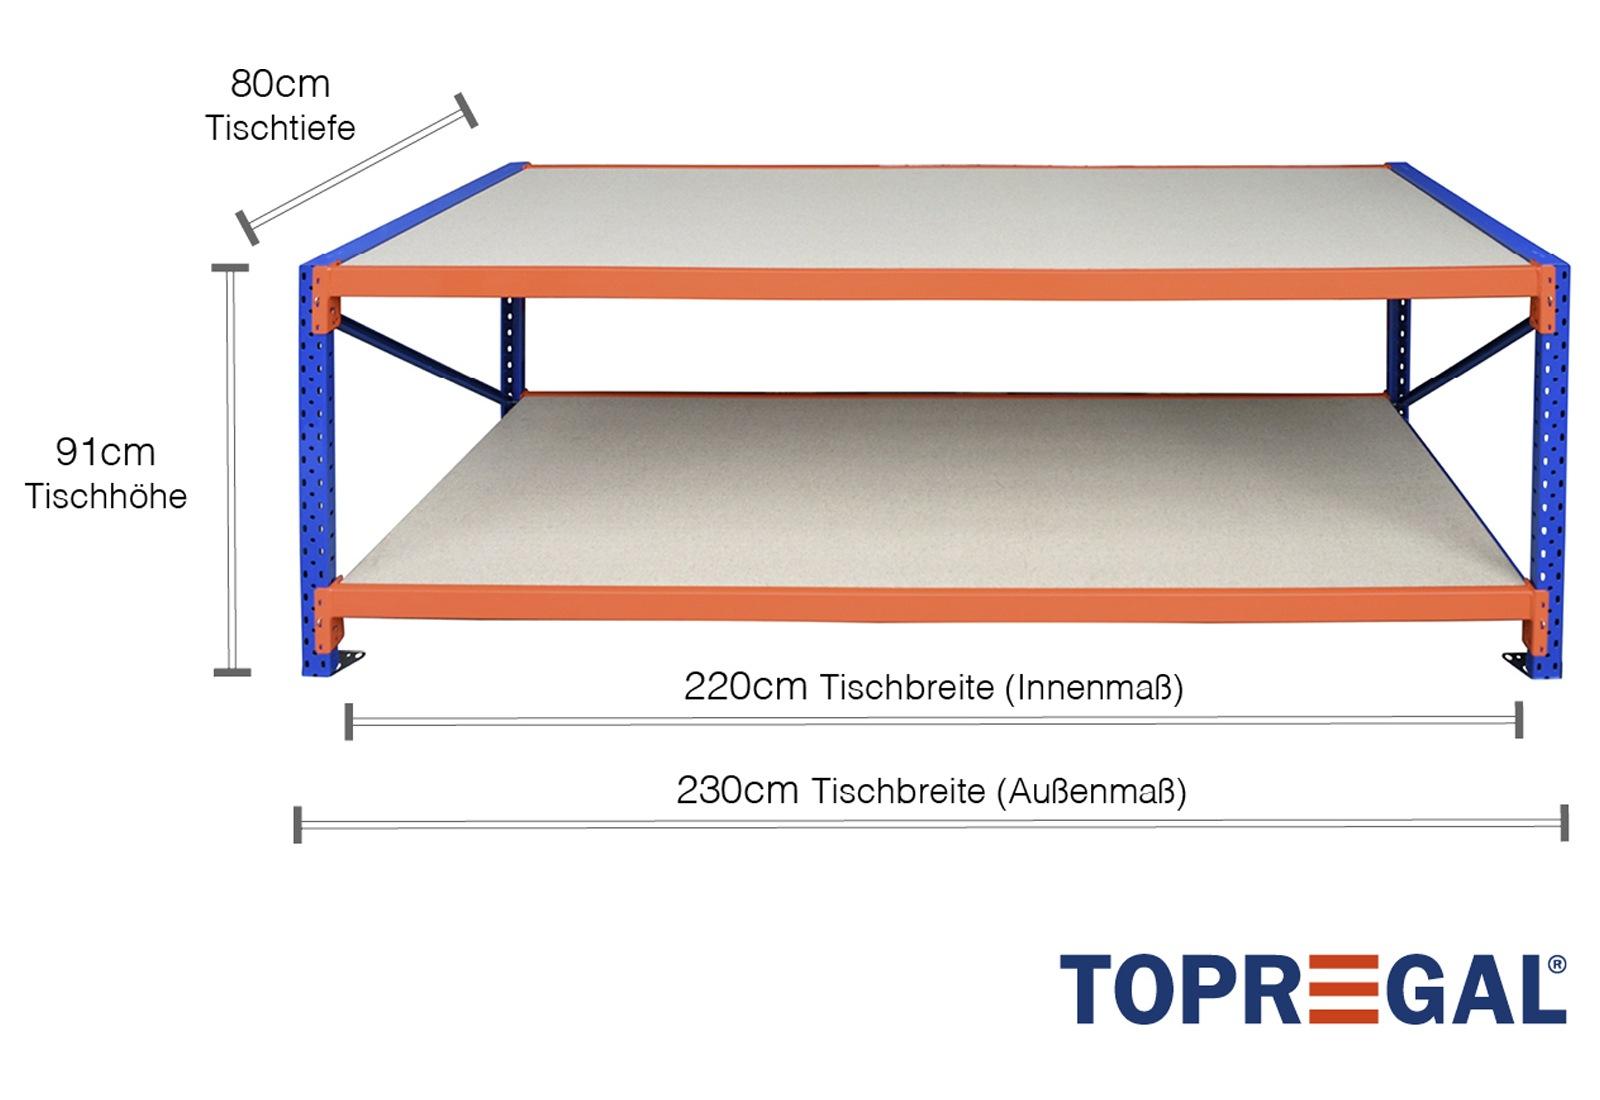 packtisch lagerregal grundtisch 2 3m mit 2 ebenen inkl holzb den 80cm tief tischh he 91cm. Black Bedroom Furniture Sets. Home Design Ideas